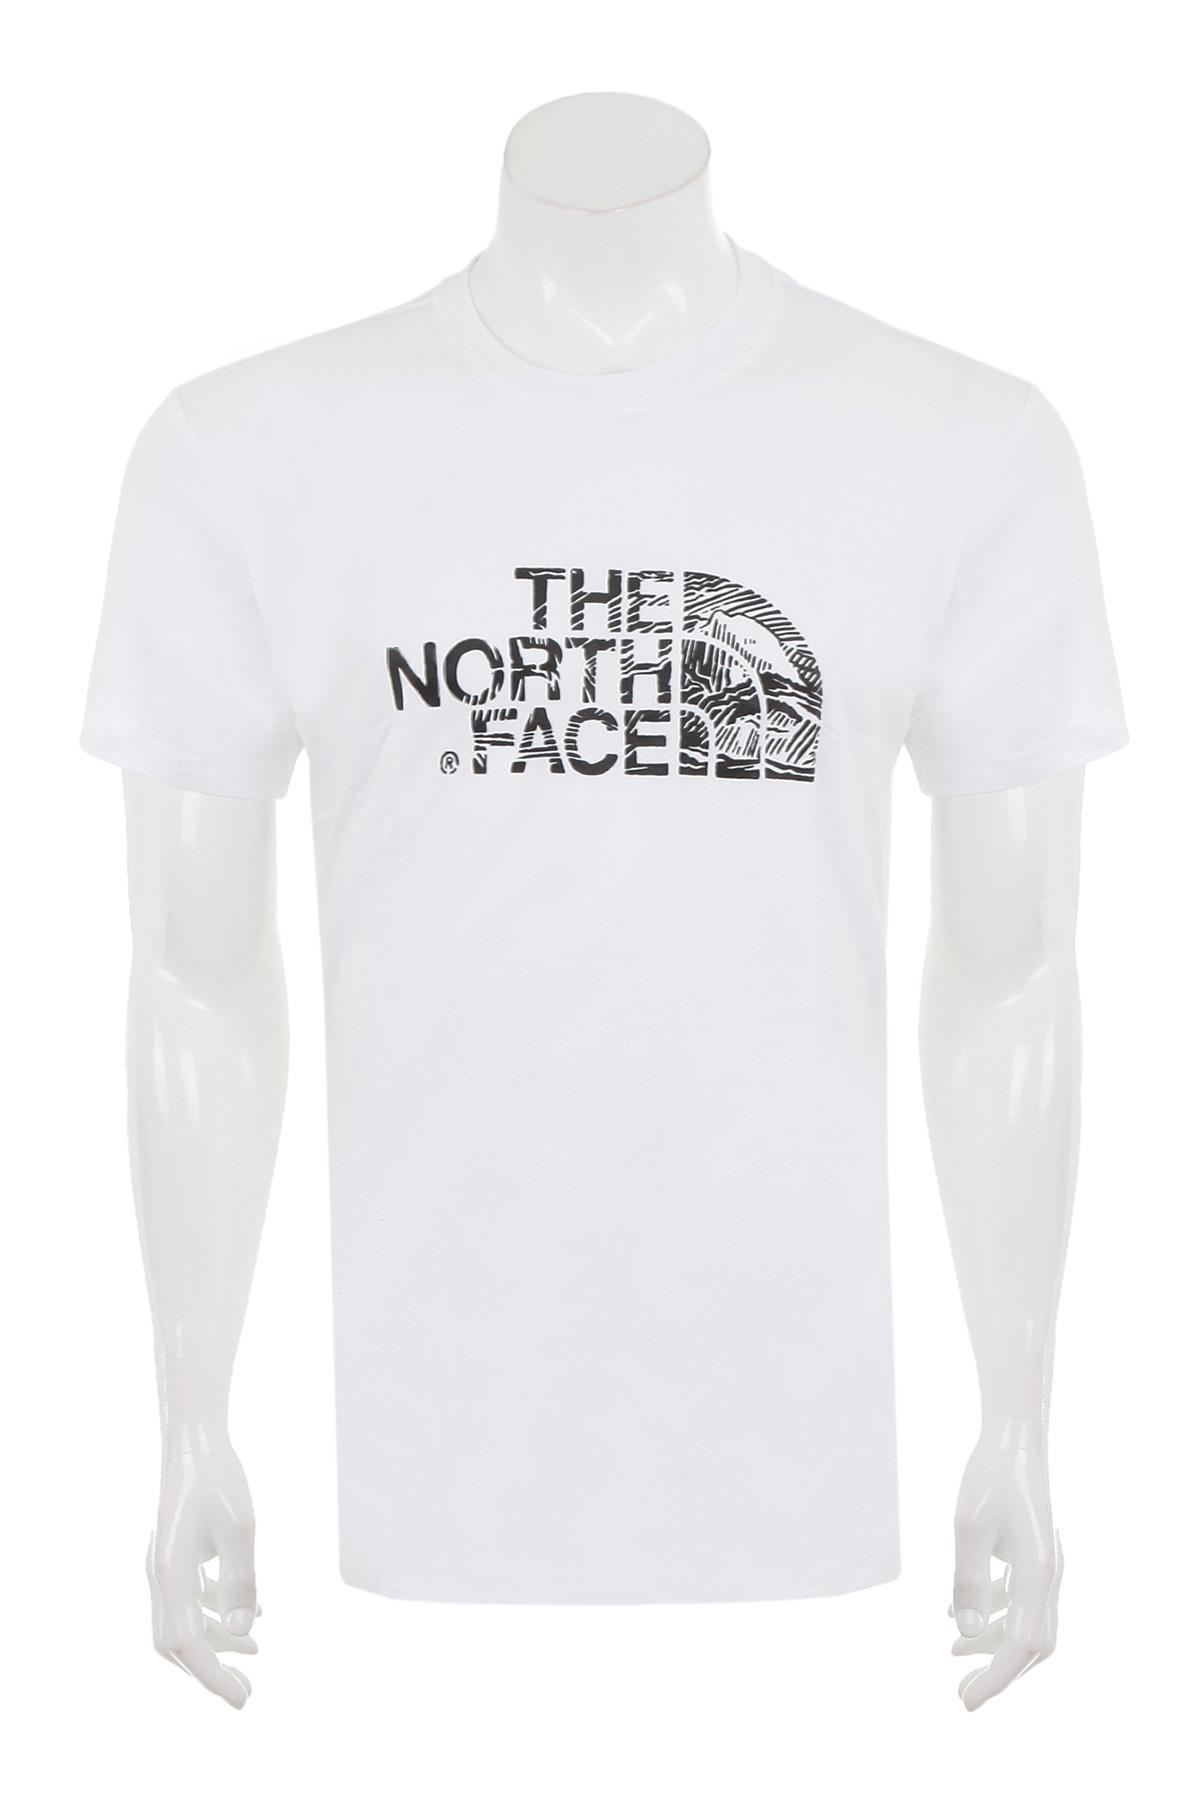 The Northface Erkek S/S Woodcut Dome Tee-Eu T0A3G1M4Q Tişört